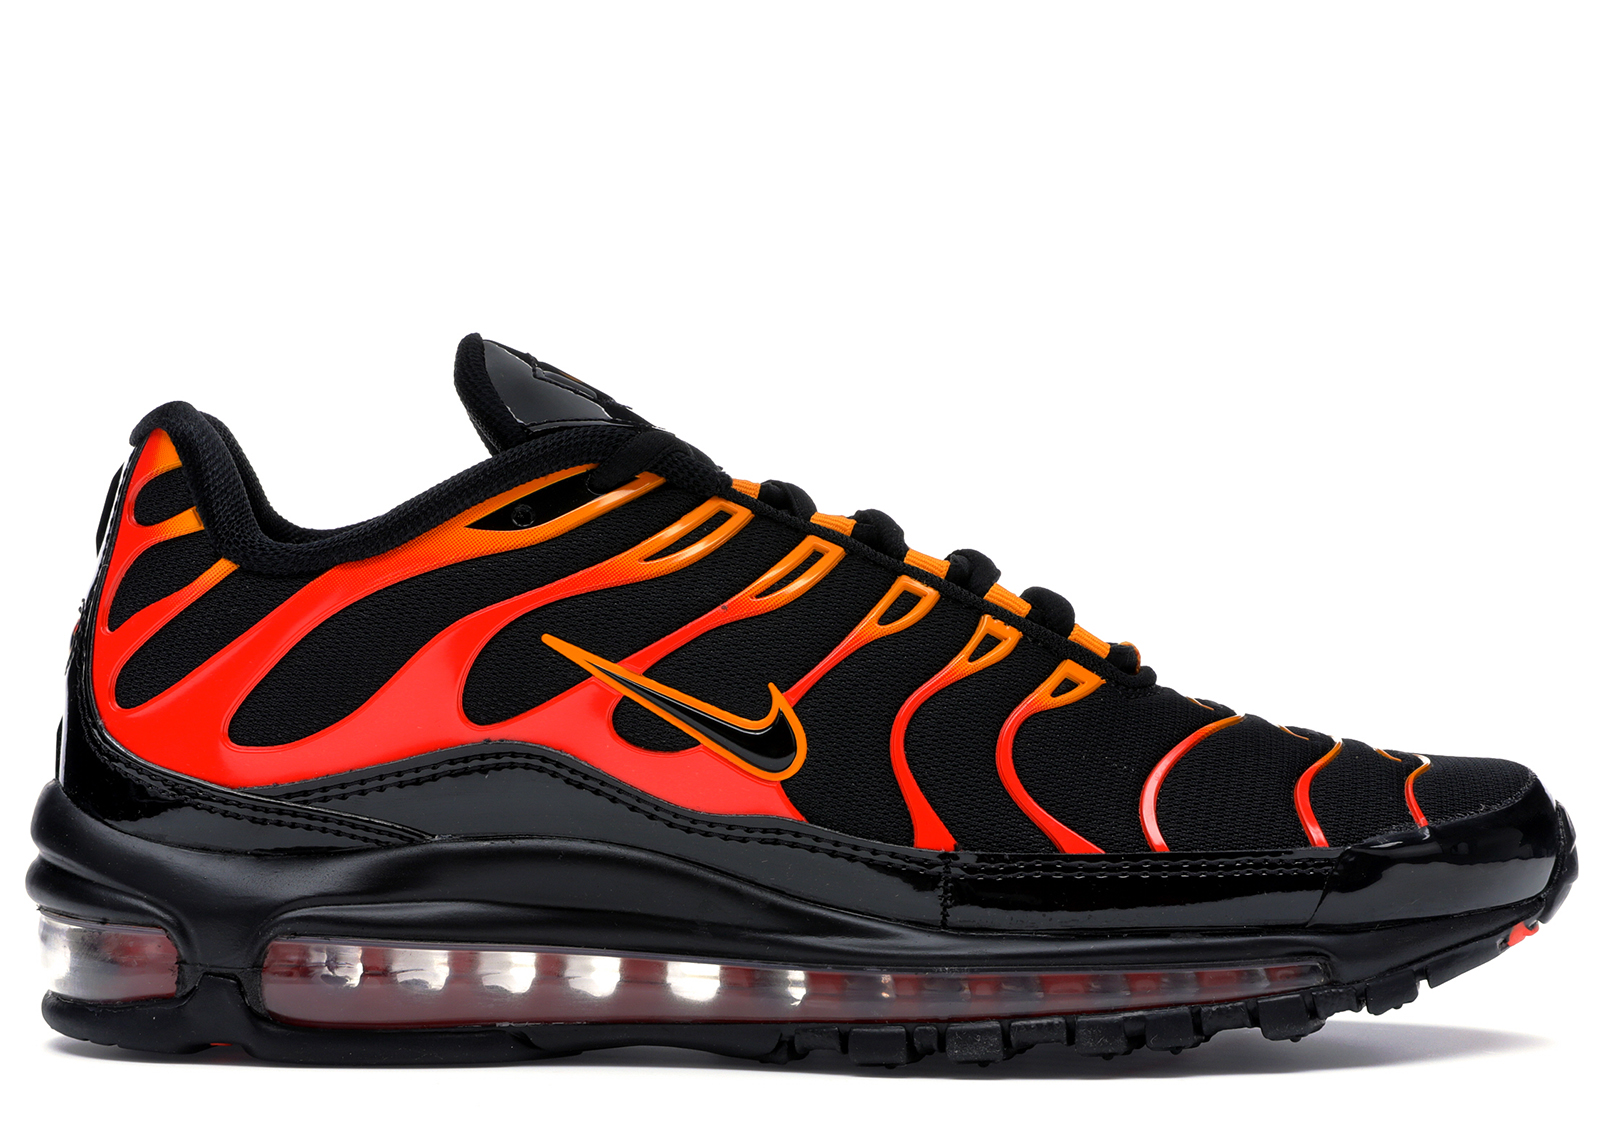 Nike Air Max 97 Plus Black Shock Orange - AH8144-002